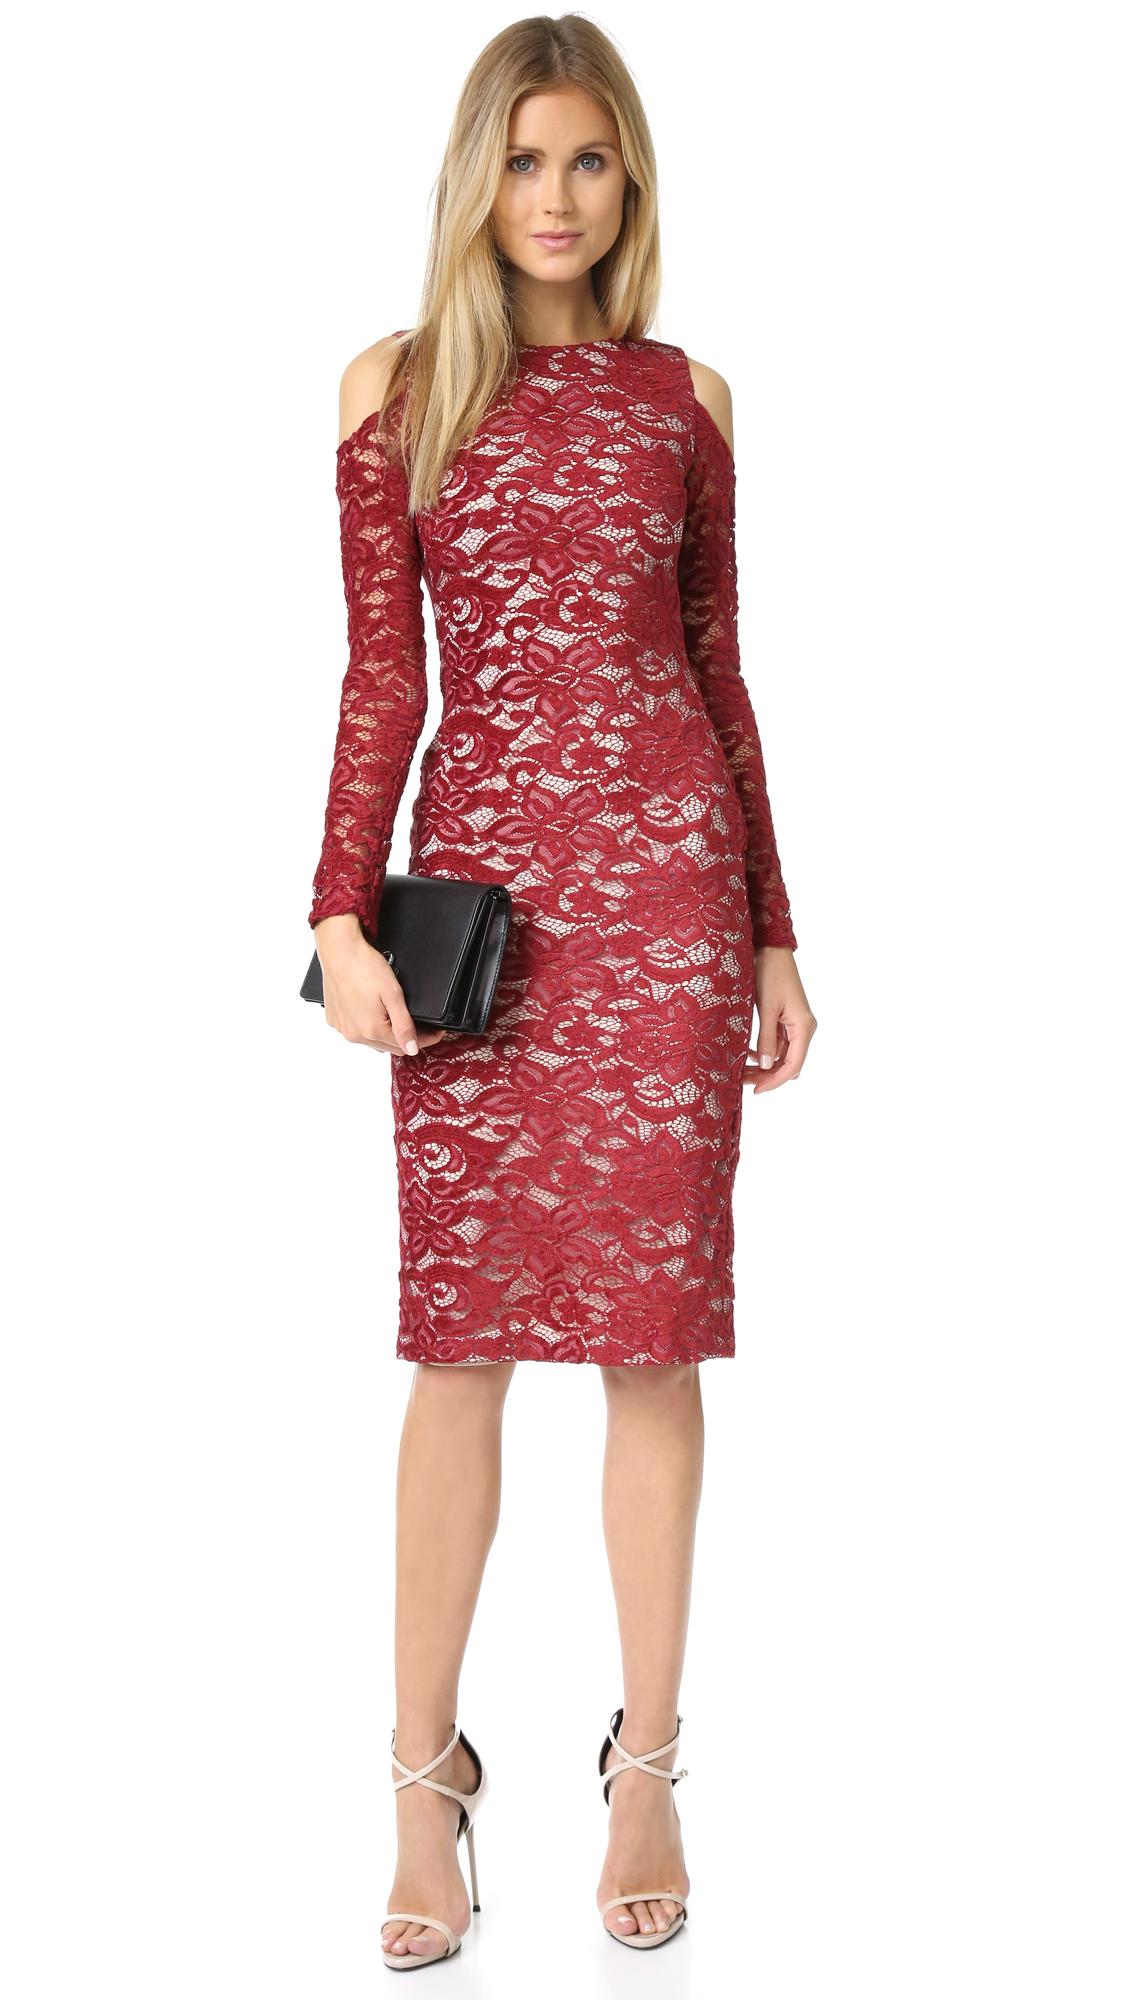 Alice Olivia Laila Open Shoulder Dress Shopbop Hoc Store Batik French Cuff